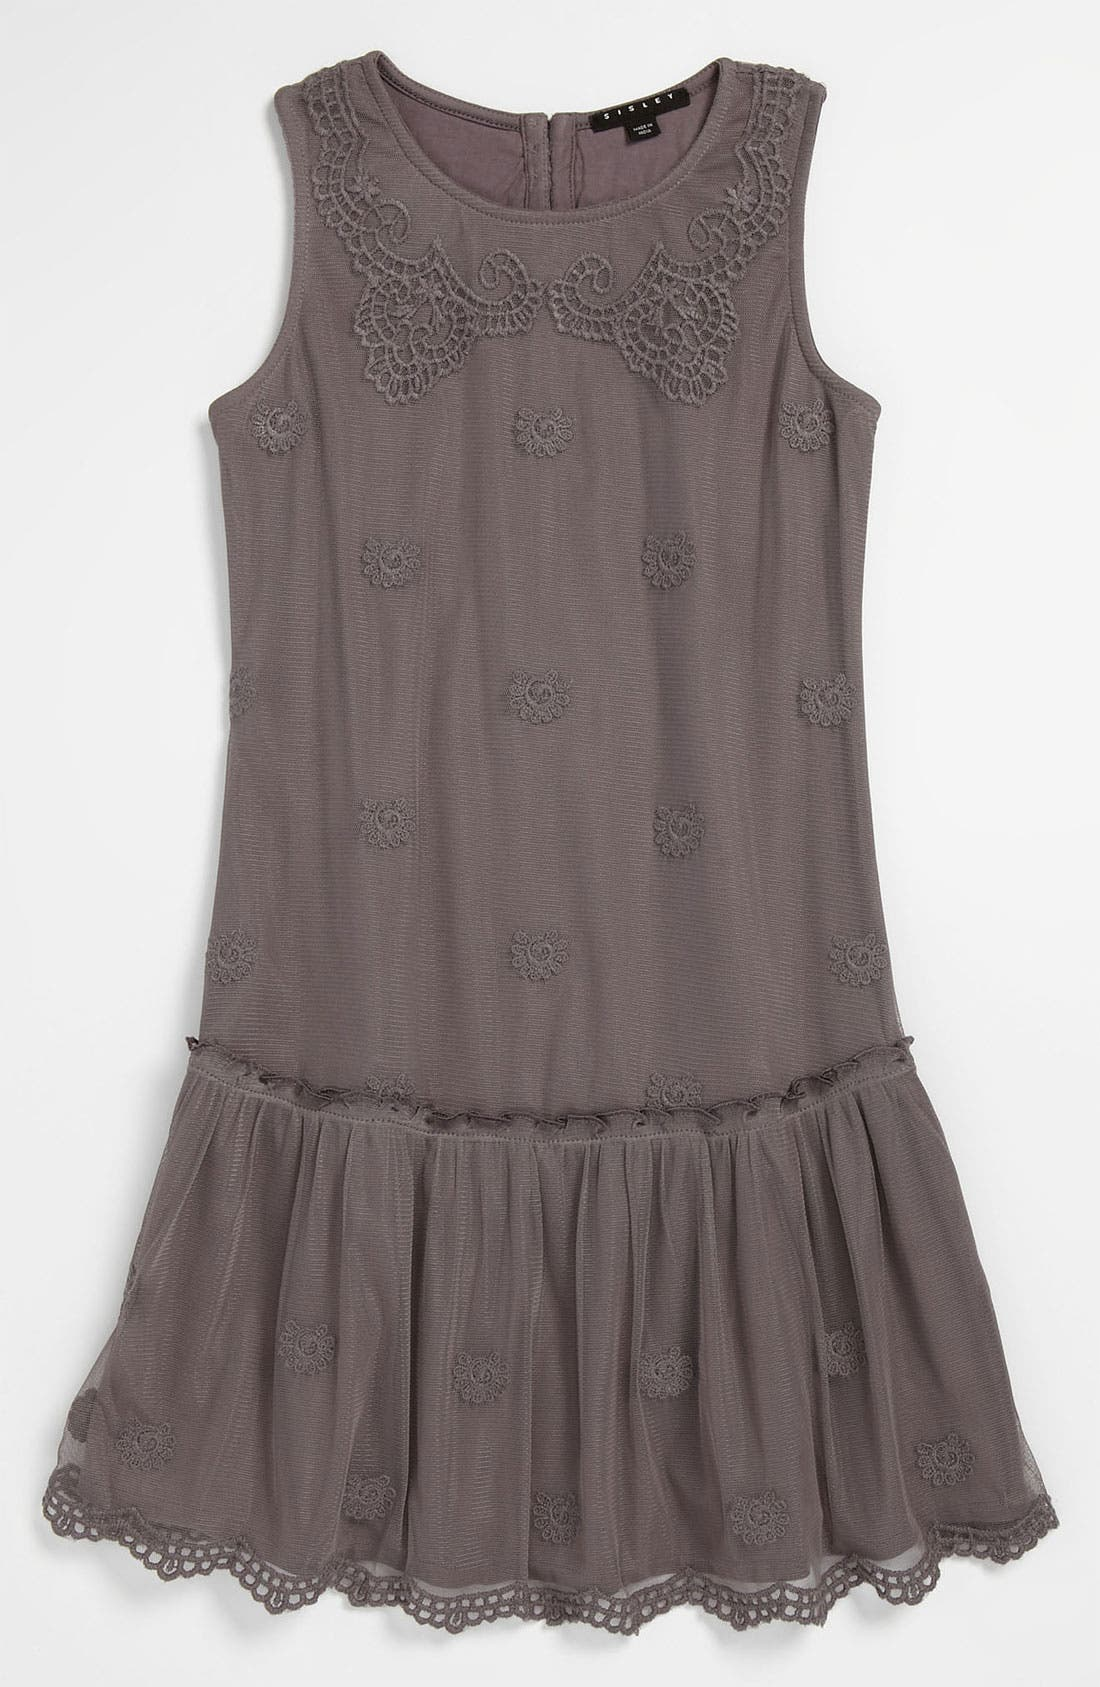 Alternate Image 1 Selected - Sisley Young Drop Waist Dress (Big Girls)